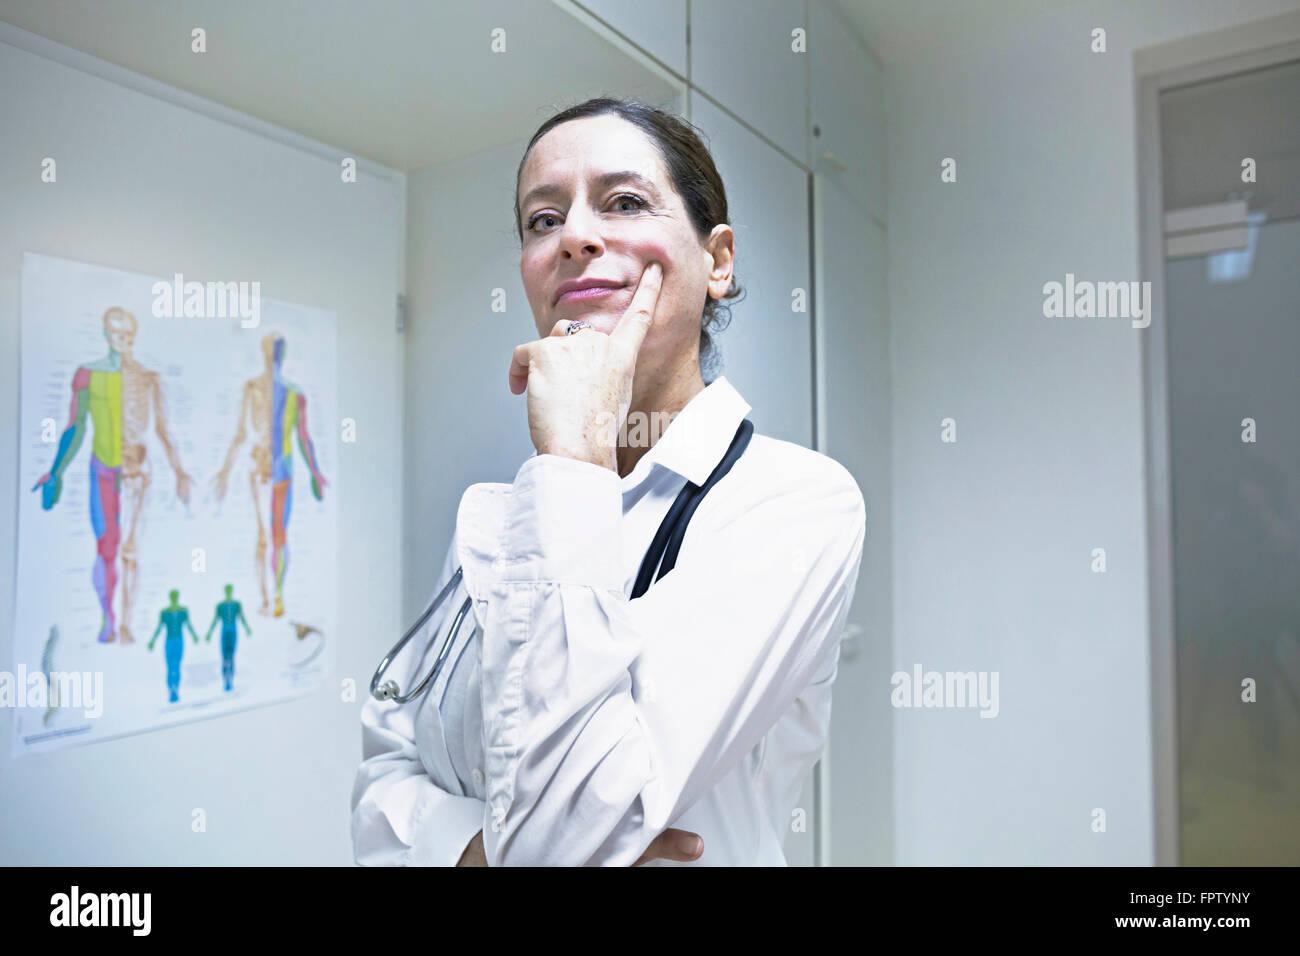 Female doctor thinking with hand on chin, Freiburg Im Breisgau, Baden-Württemberg, Germany - Stock Image